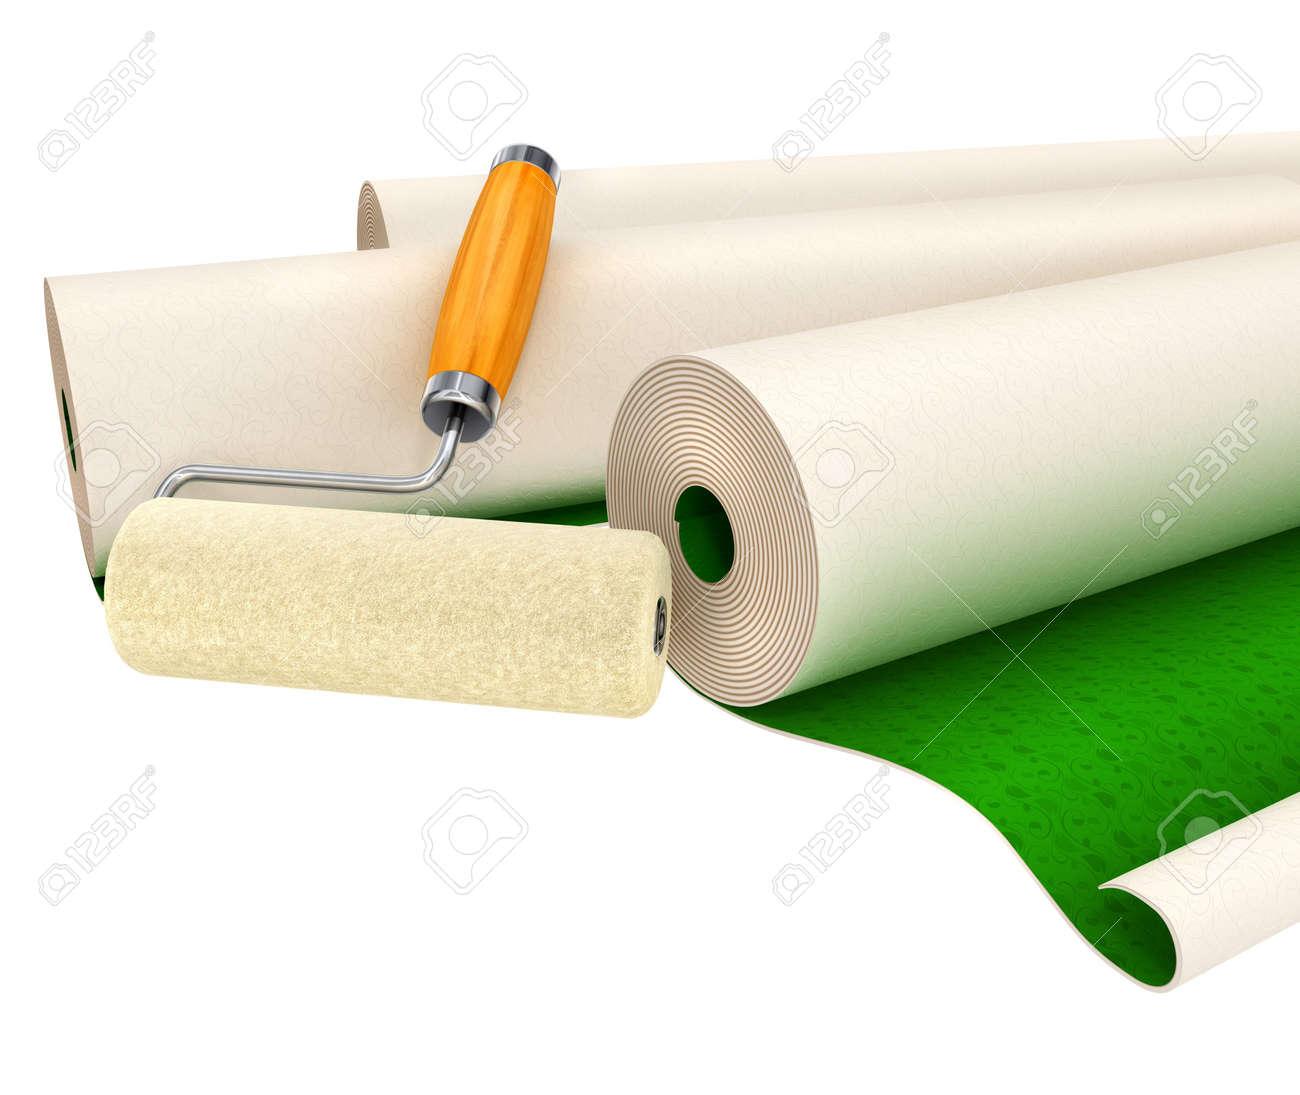 Tapeten Und Roller Tool Fur Haus Reparieren Isoliert 3d Illustration